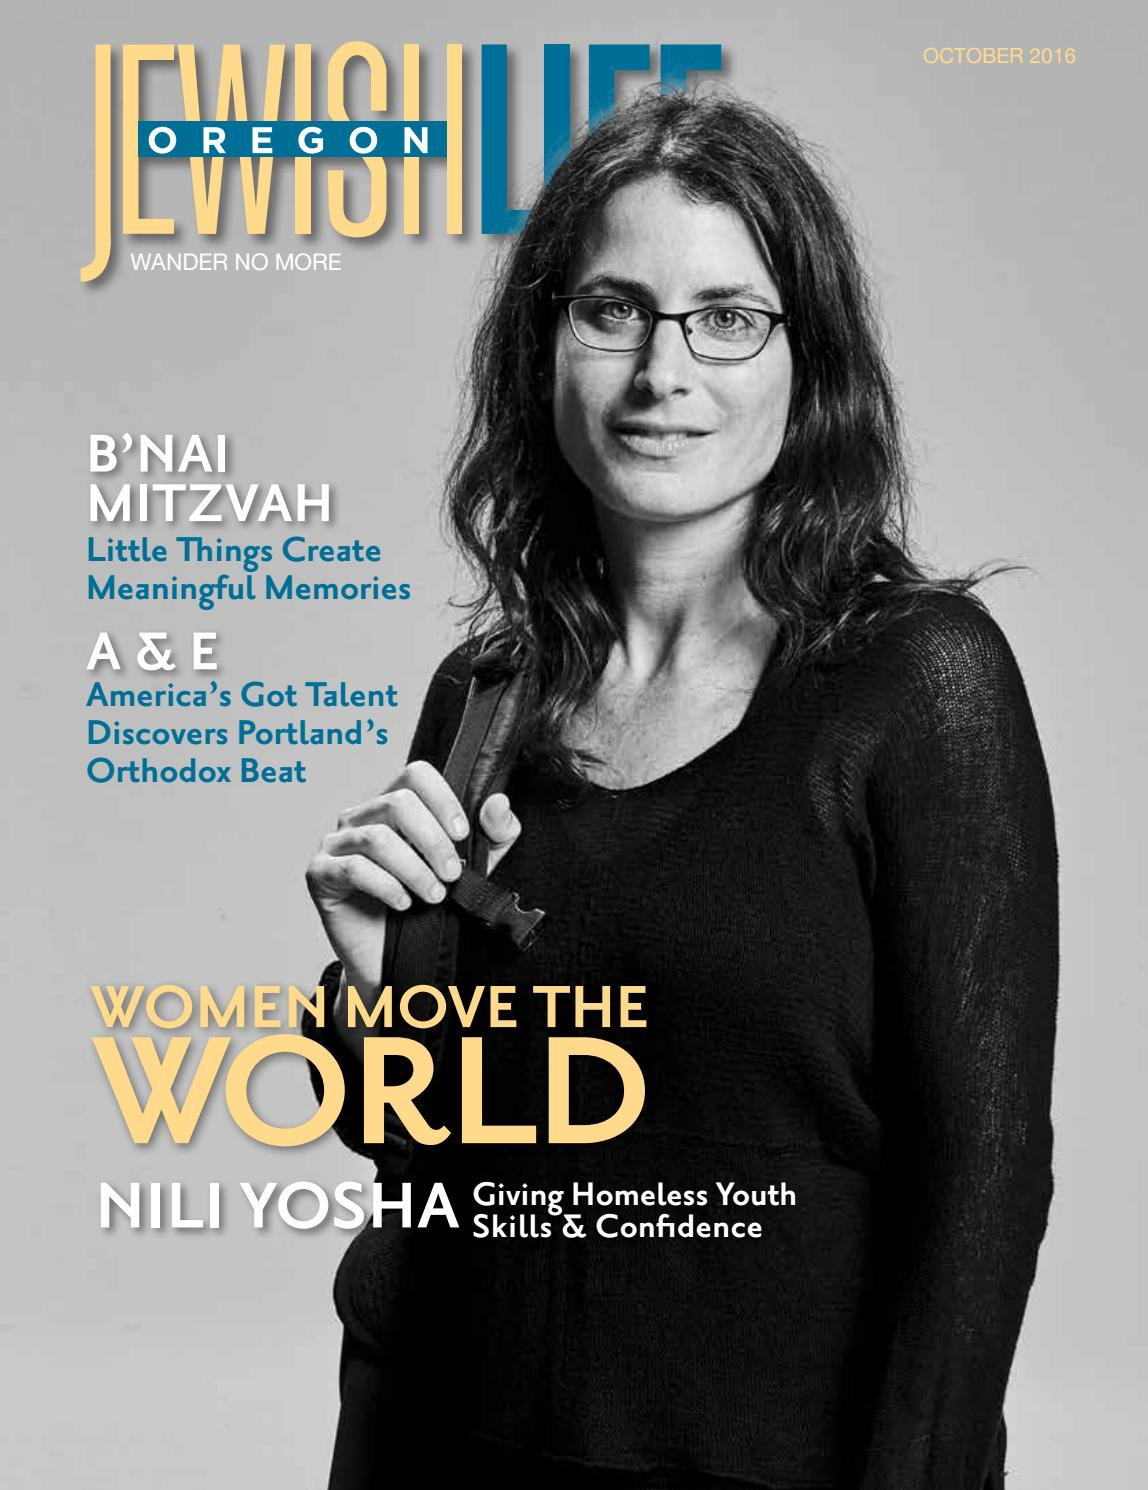 4f837a4fdbf Oregon Jewish Life October 2016 Vol.5 Issue 8 by JewishLifeMagazine ...